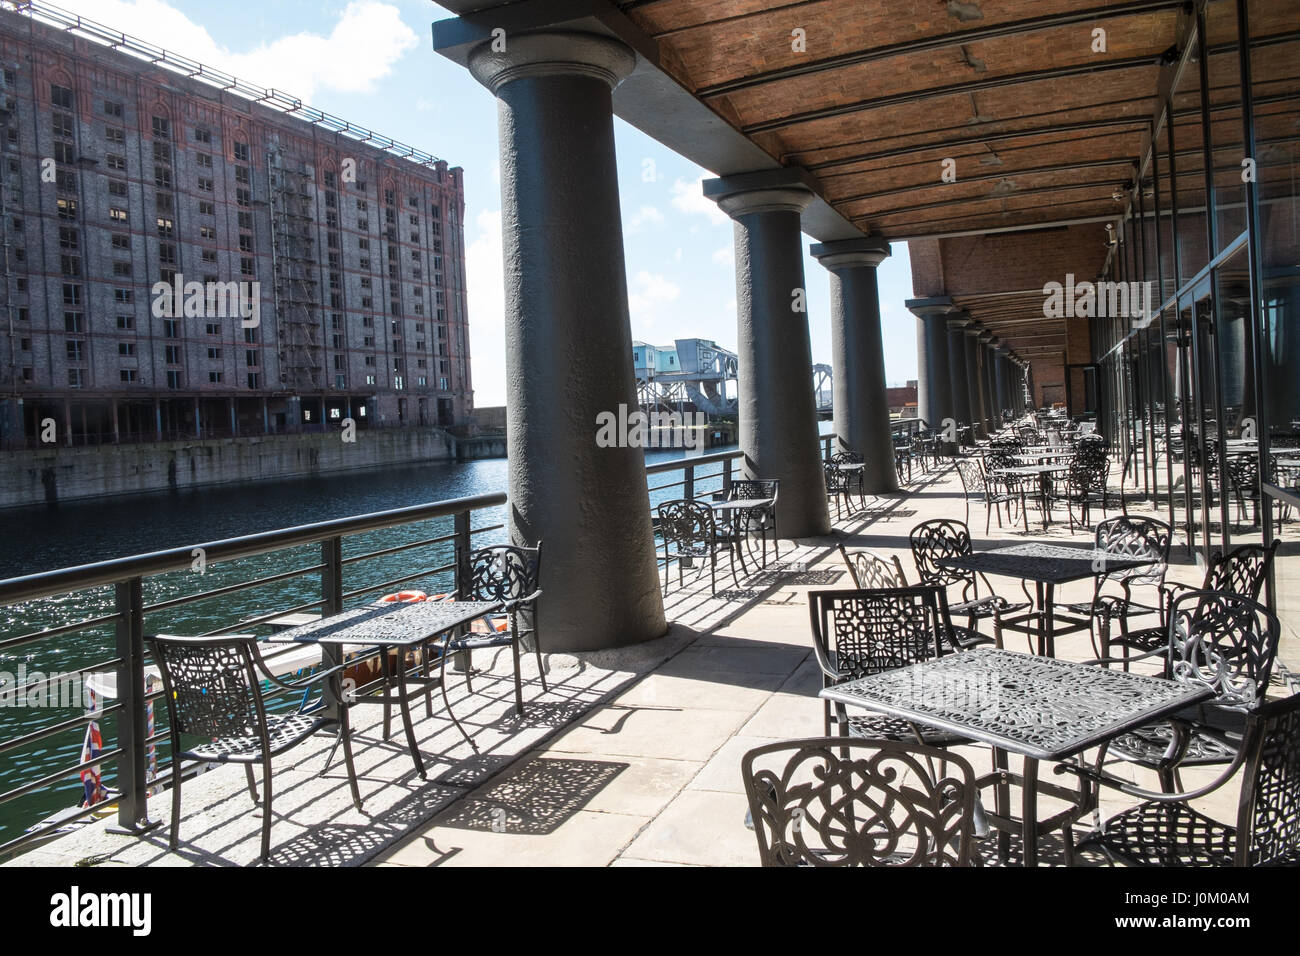 Titanic Hotel,Stanley Dock,Liverpool,Merseyside,England,UNESCO,World Heritage City,City,Northern,North,England,English,UK. Stock Photo